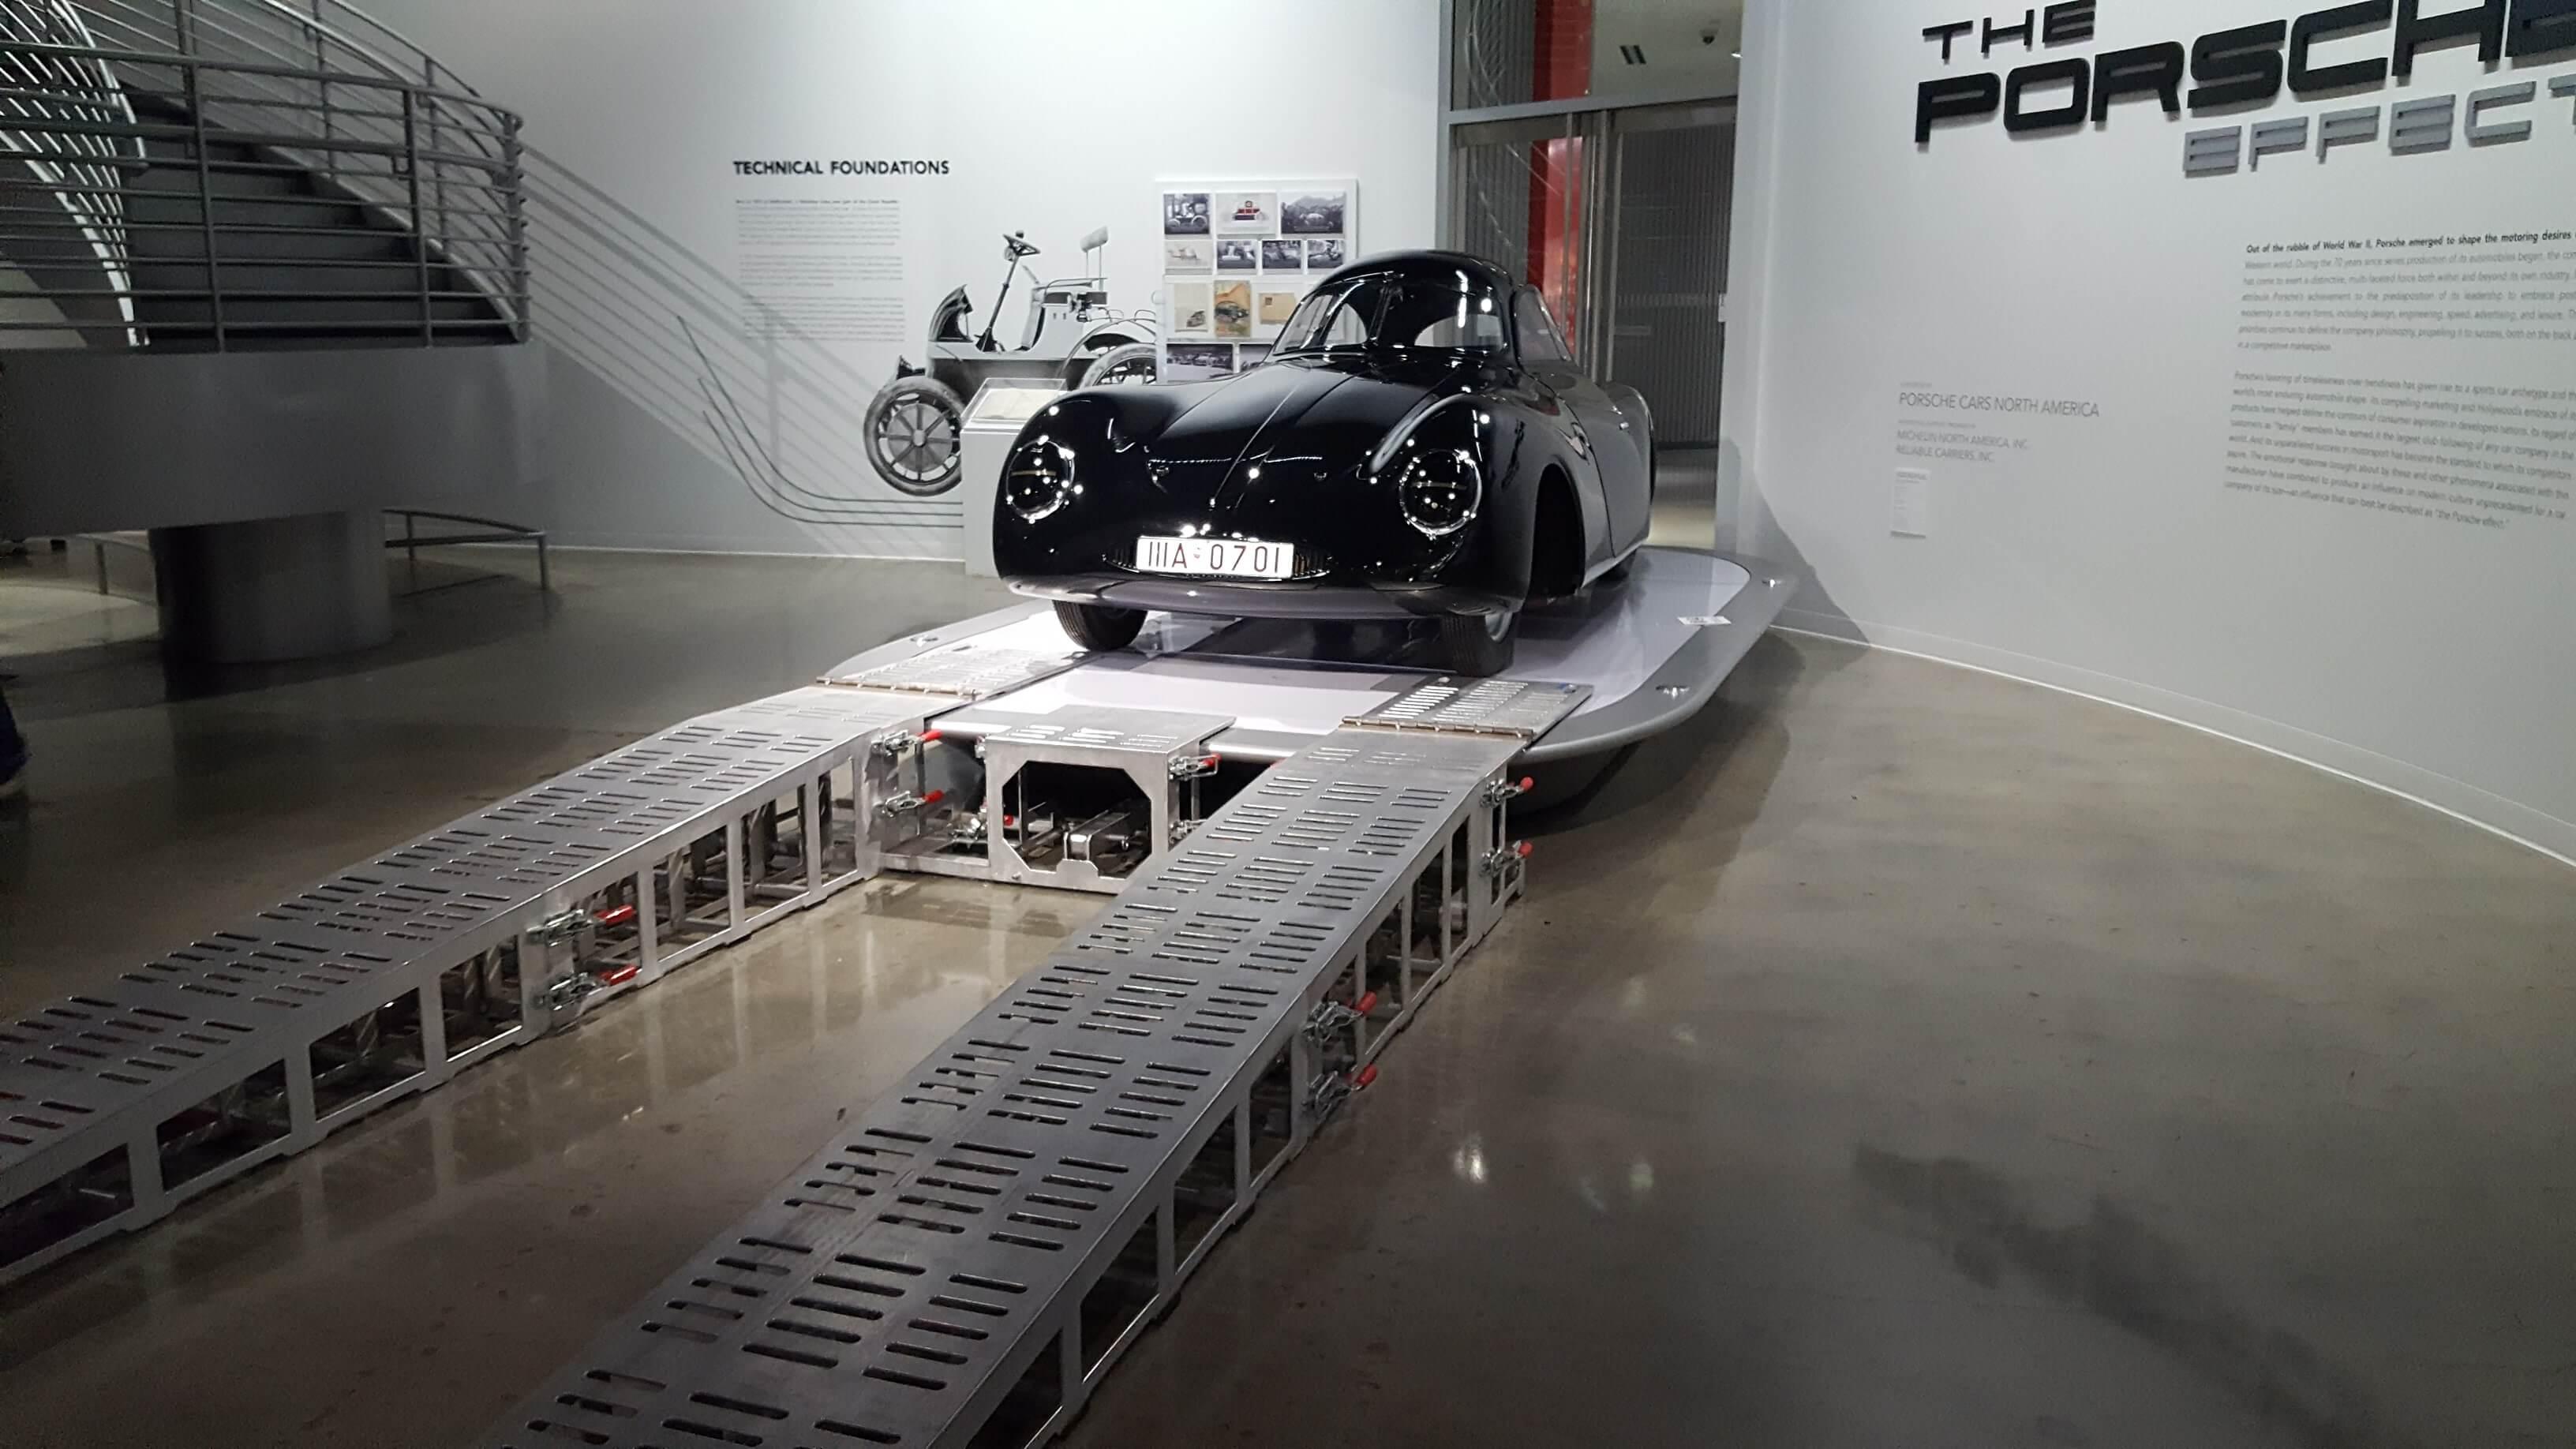 Der Abtransport aus dem Petersen Automotive Museum beginnt. © Thomas Görny